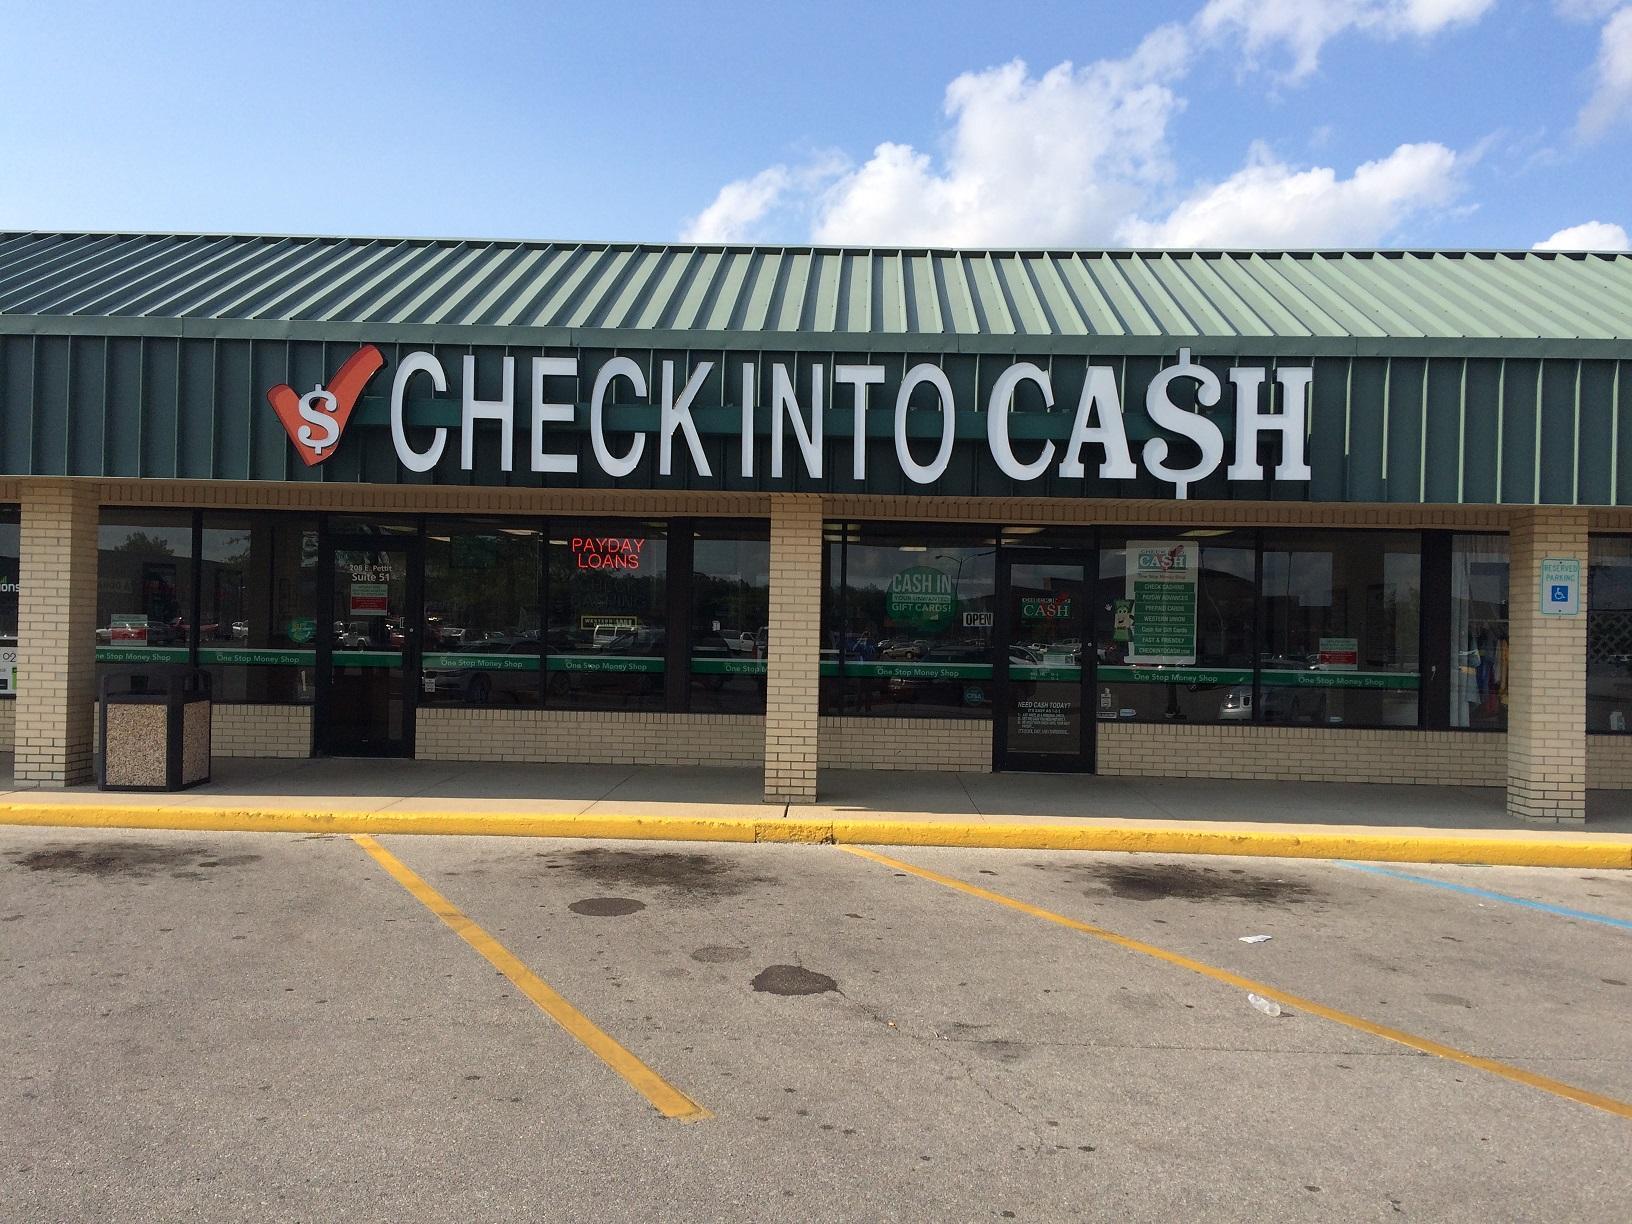 $745 Fast Payday Loans no Credit Check